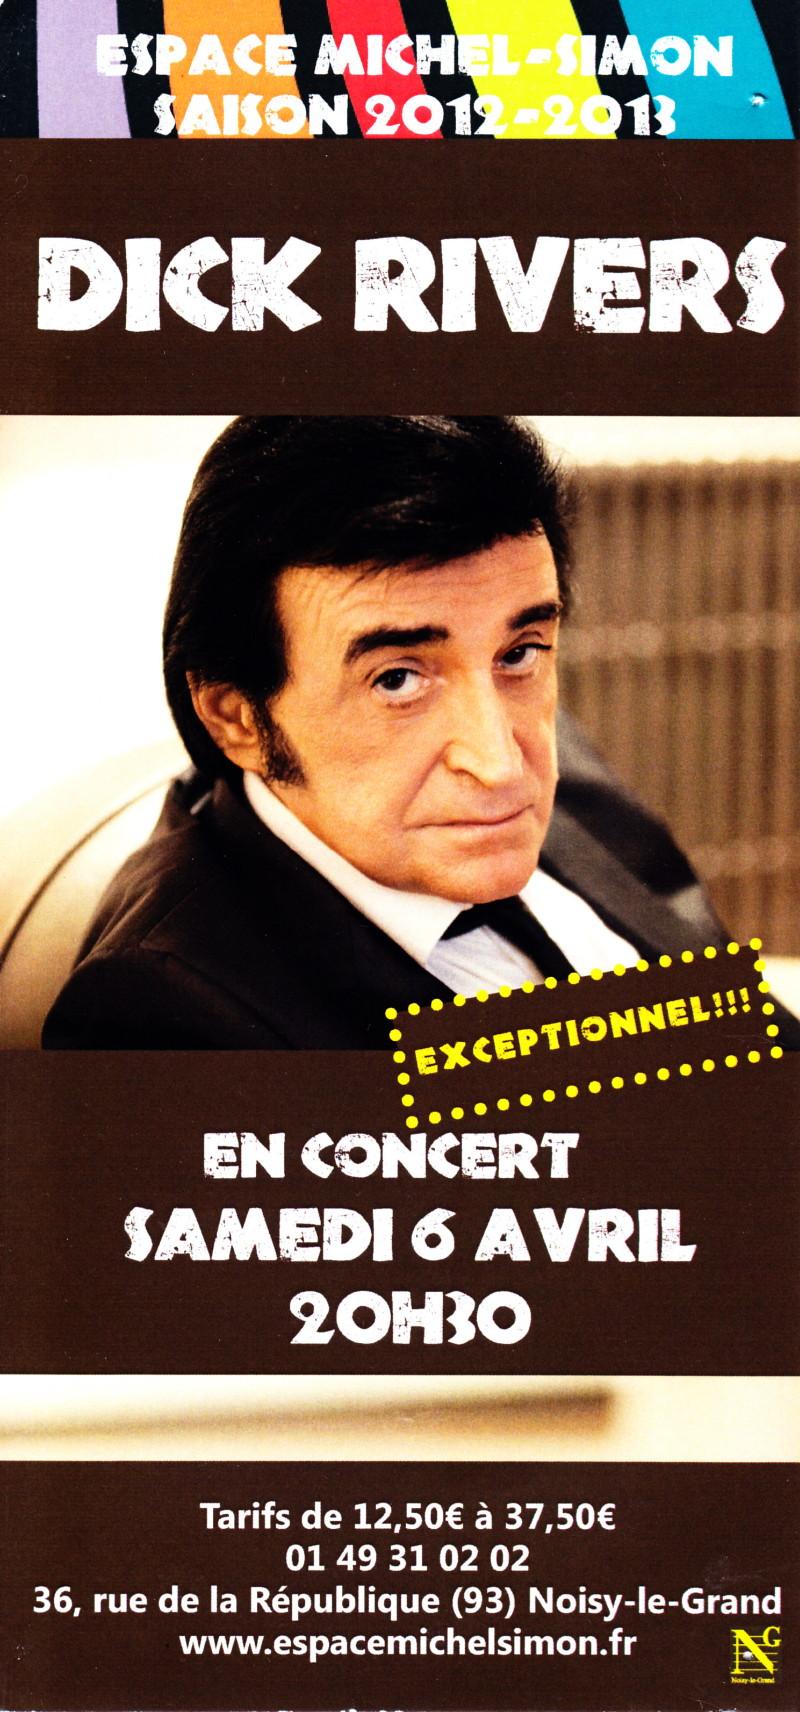 "DICK RIVERS ""Mister D Tour"" 2011/2013 : compte rendu (Casino de Paris, Olympia, Noisy, Clamart) 13082303125615789311487514"